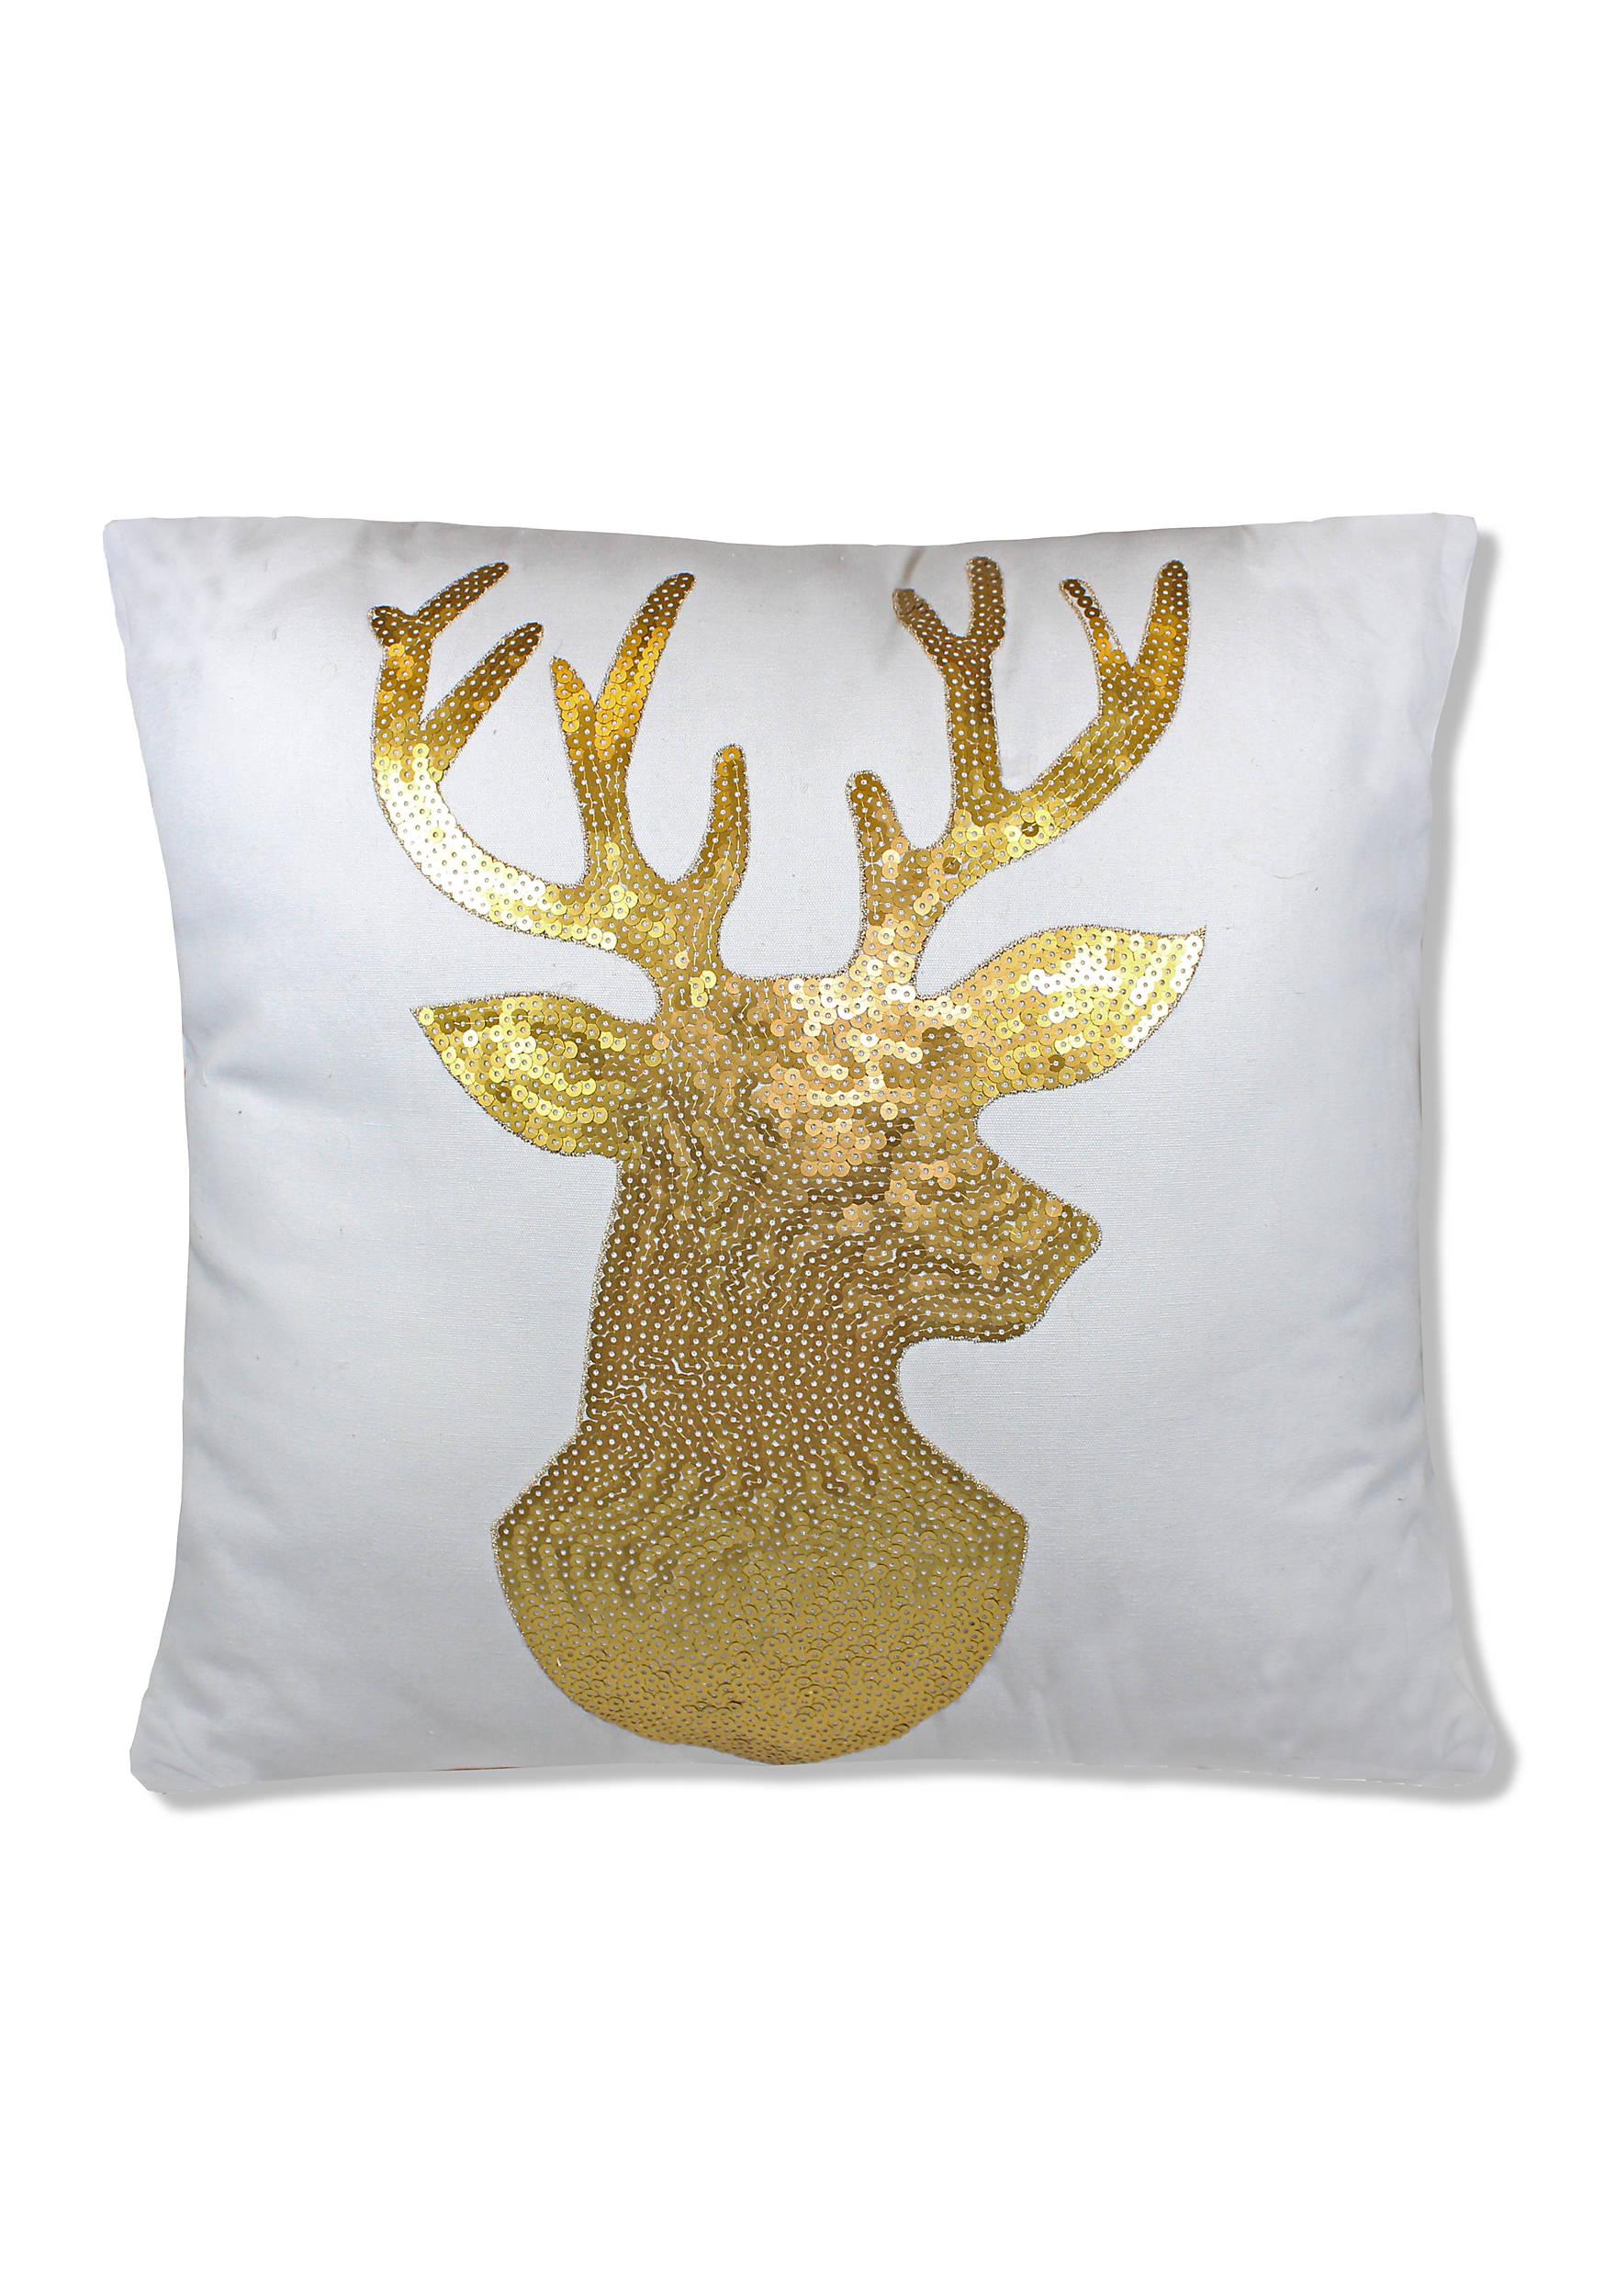 Navy blue and yellow decorative pillows - Sequin Reindeer Decorative Pillow